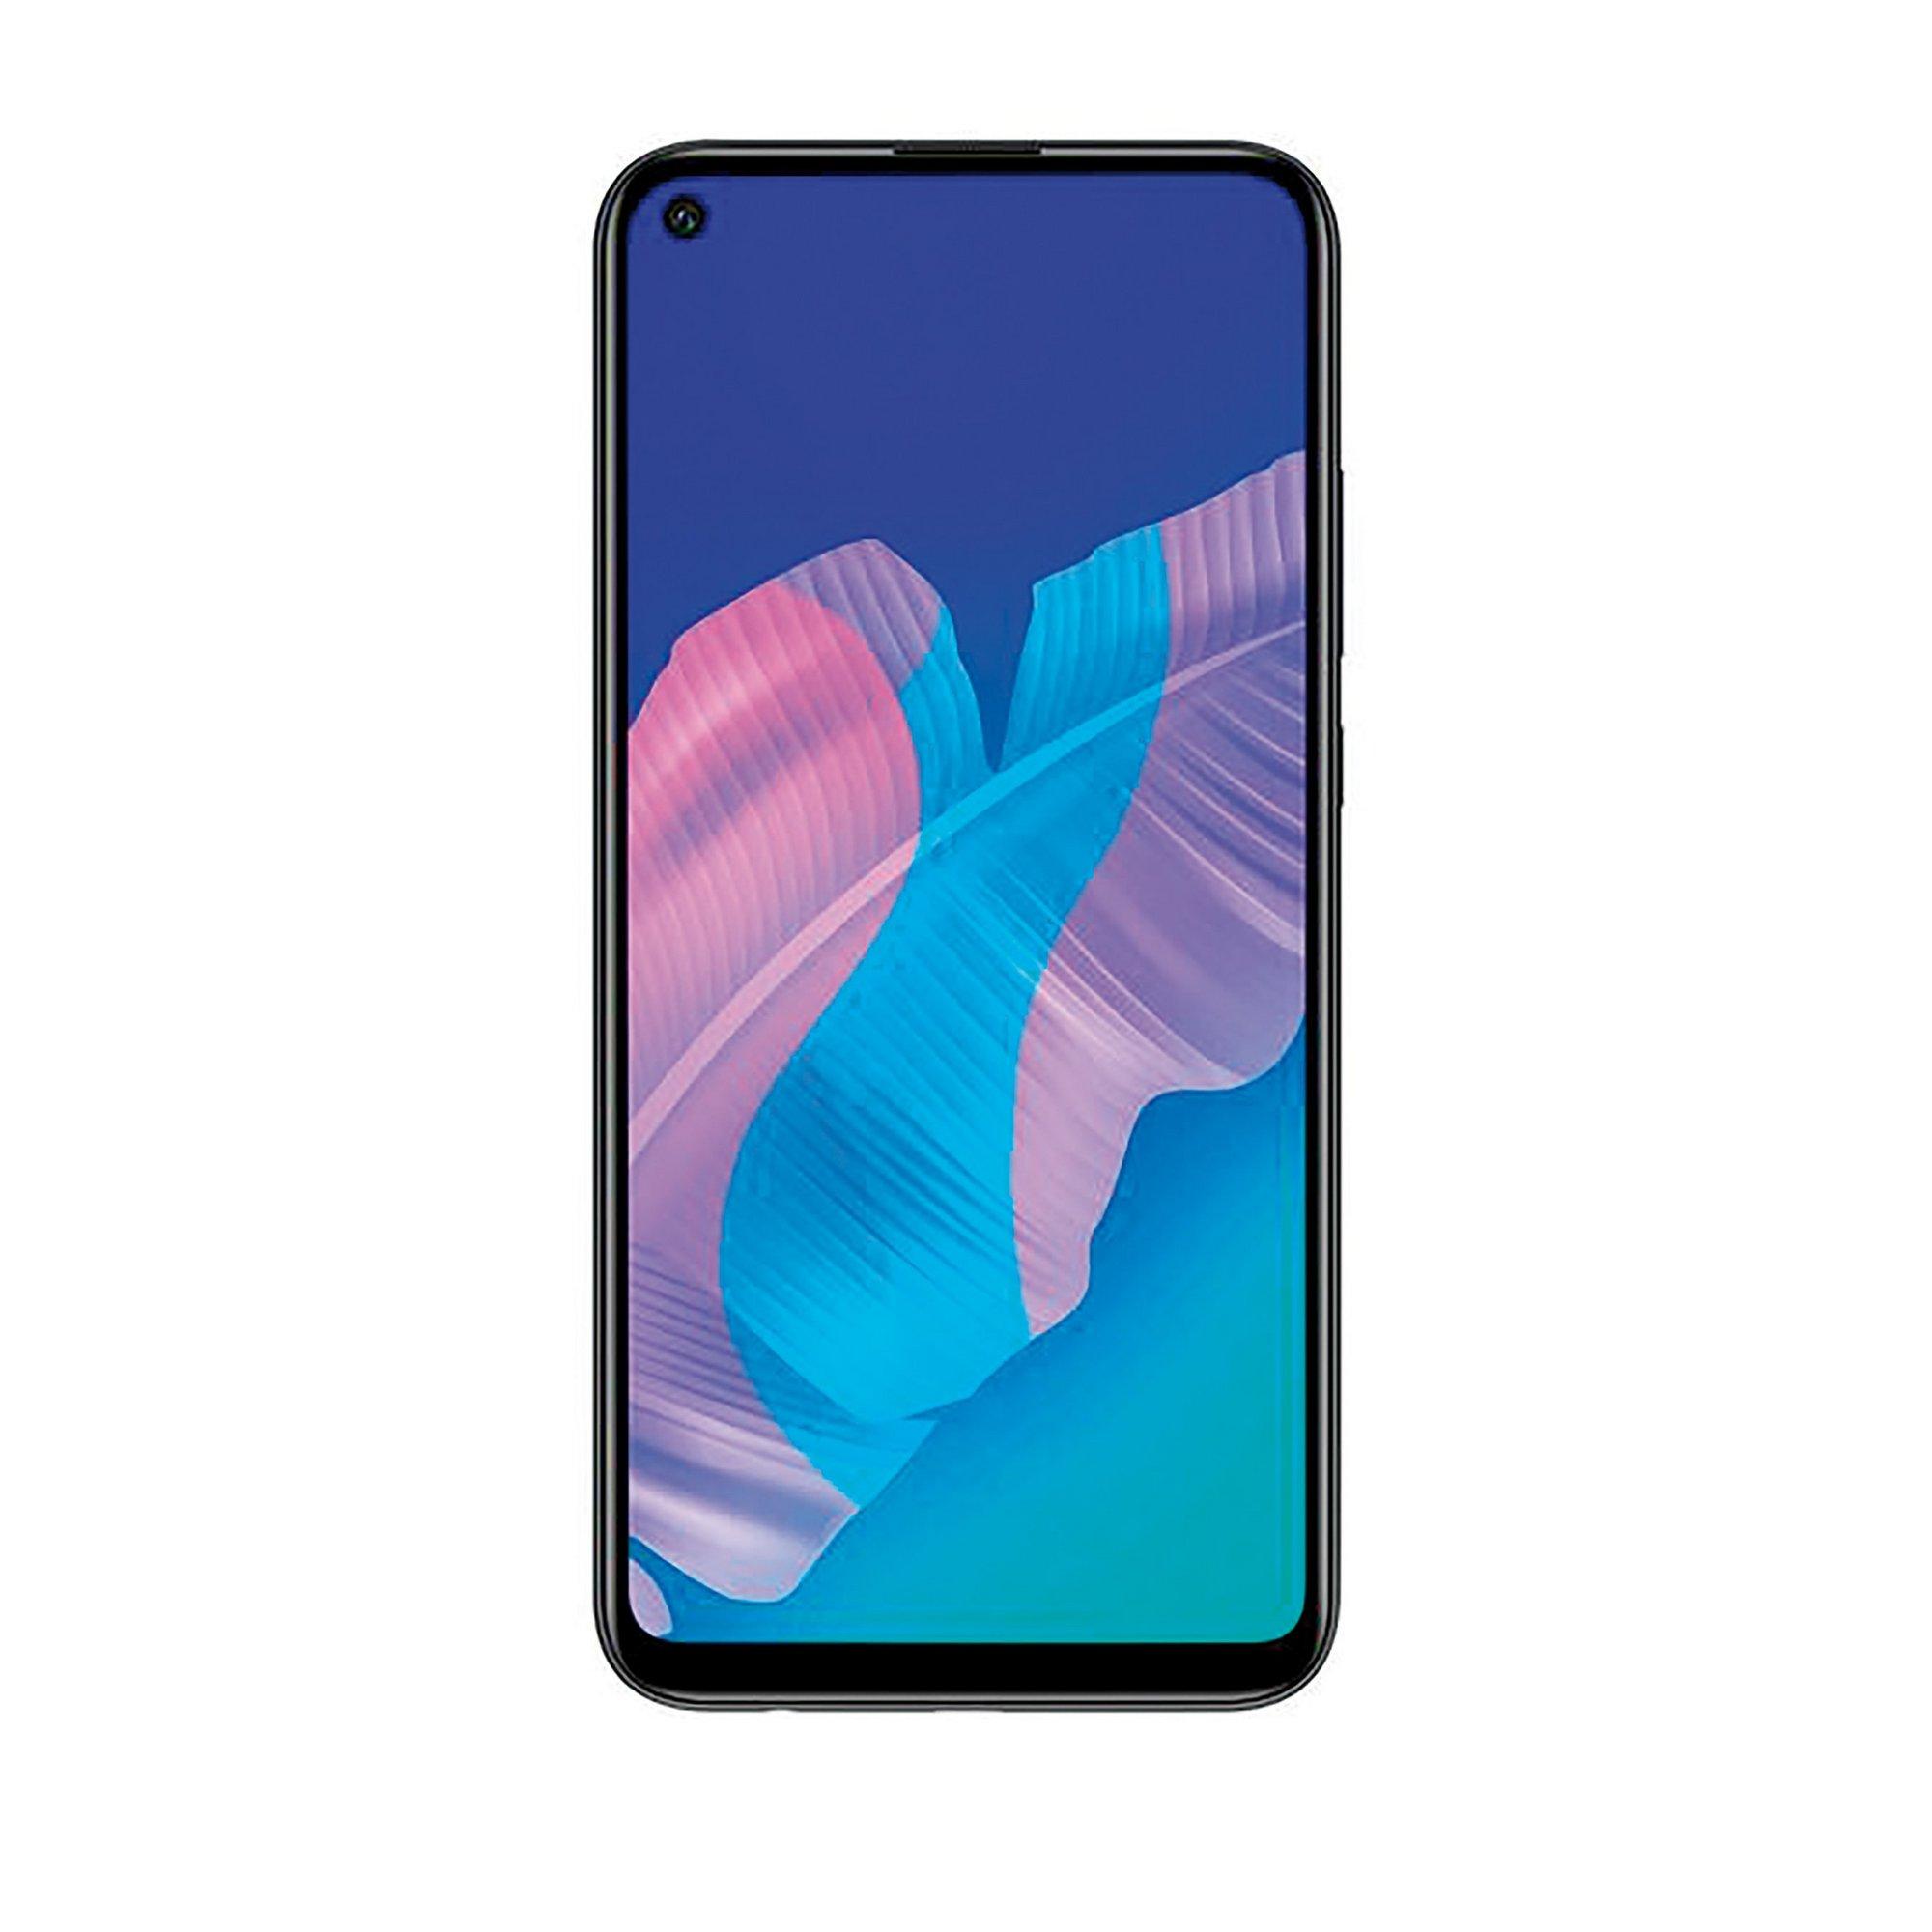 Image of Huawei P40 Lite E - Black